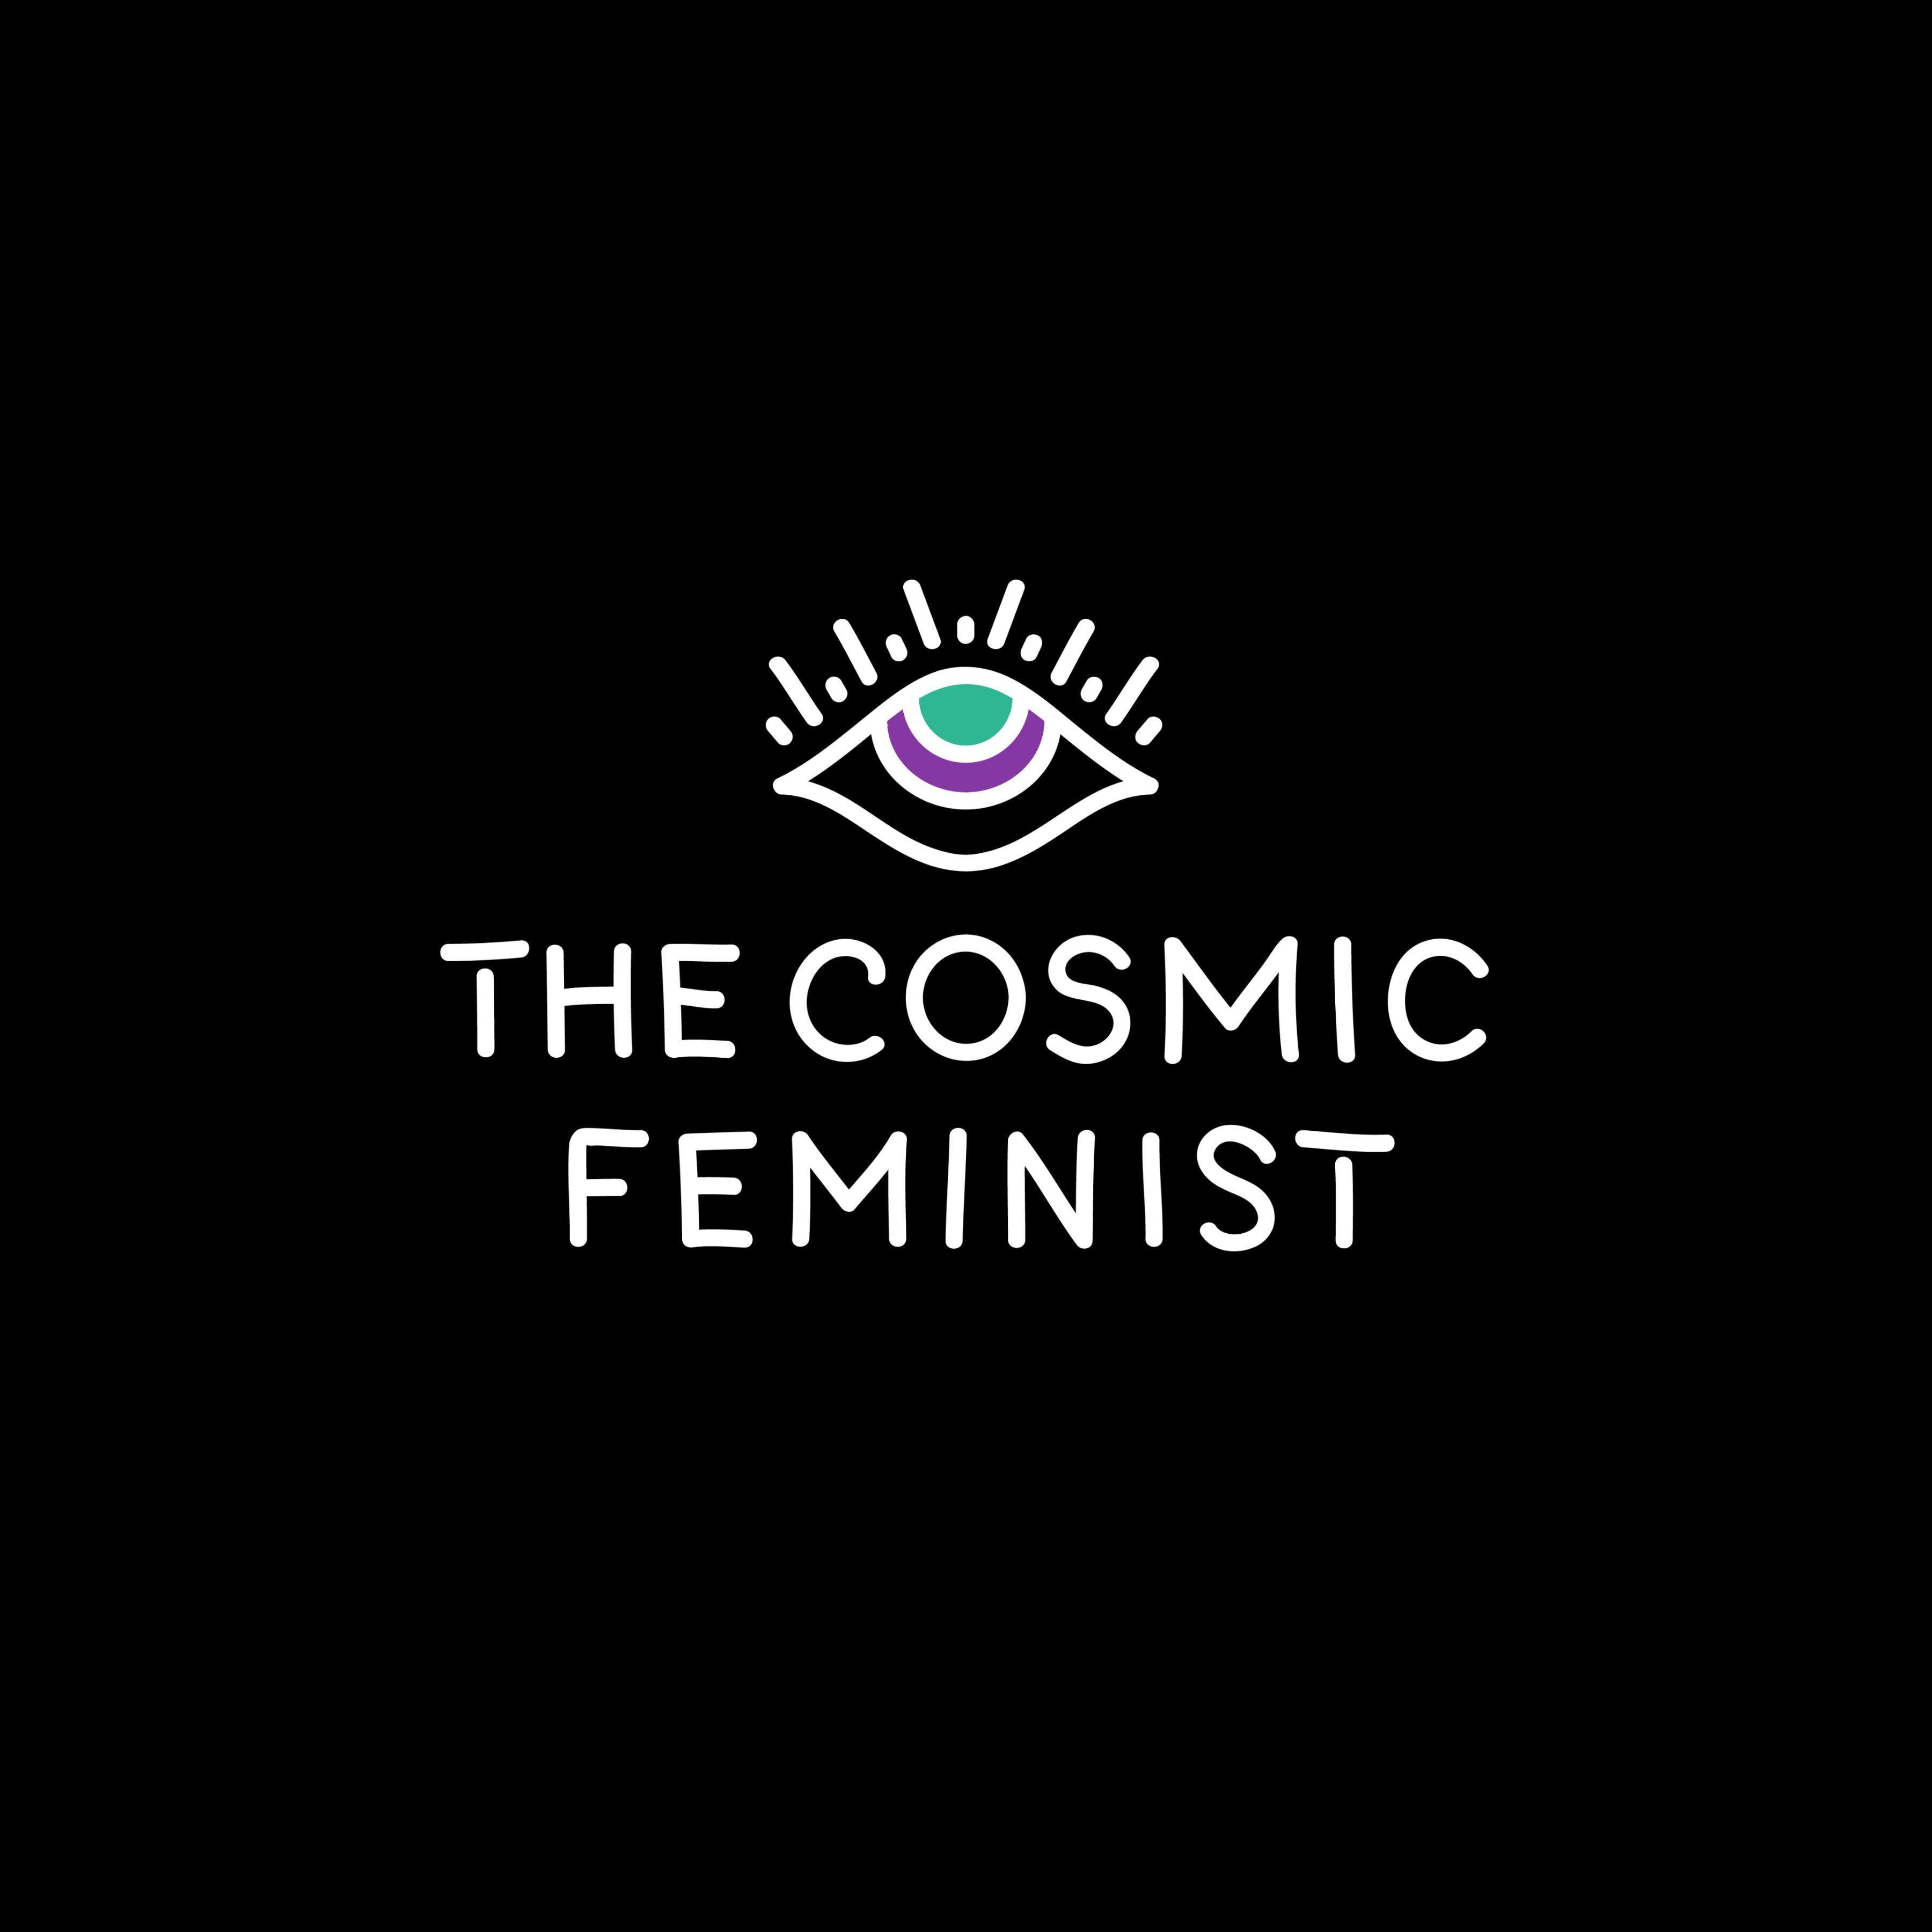 The Cosmic Feminist